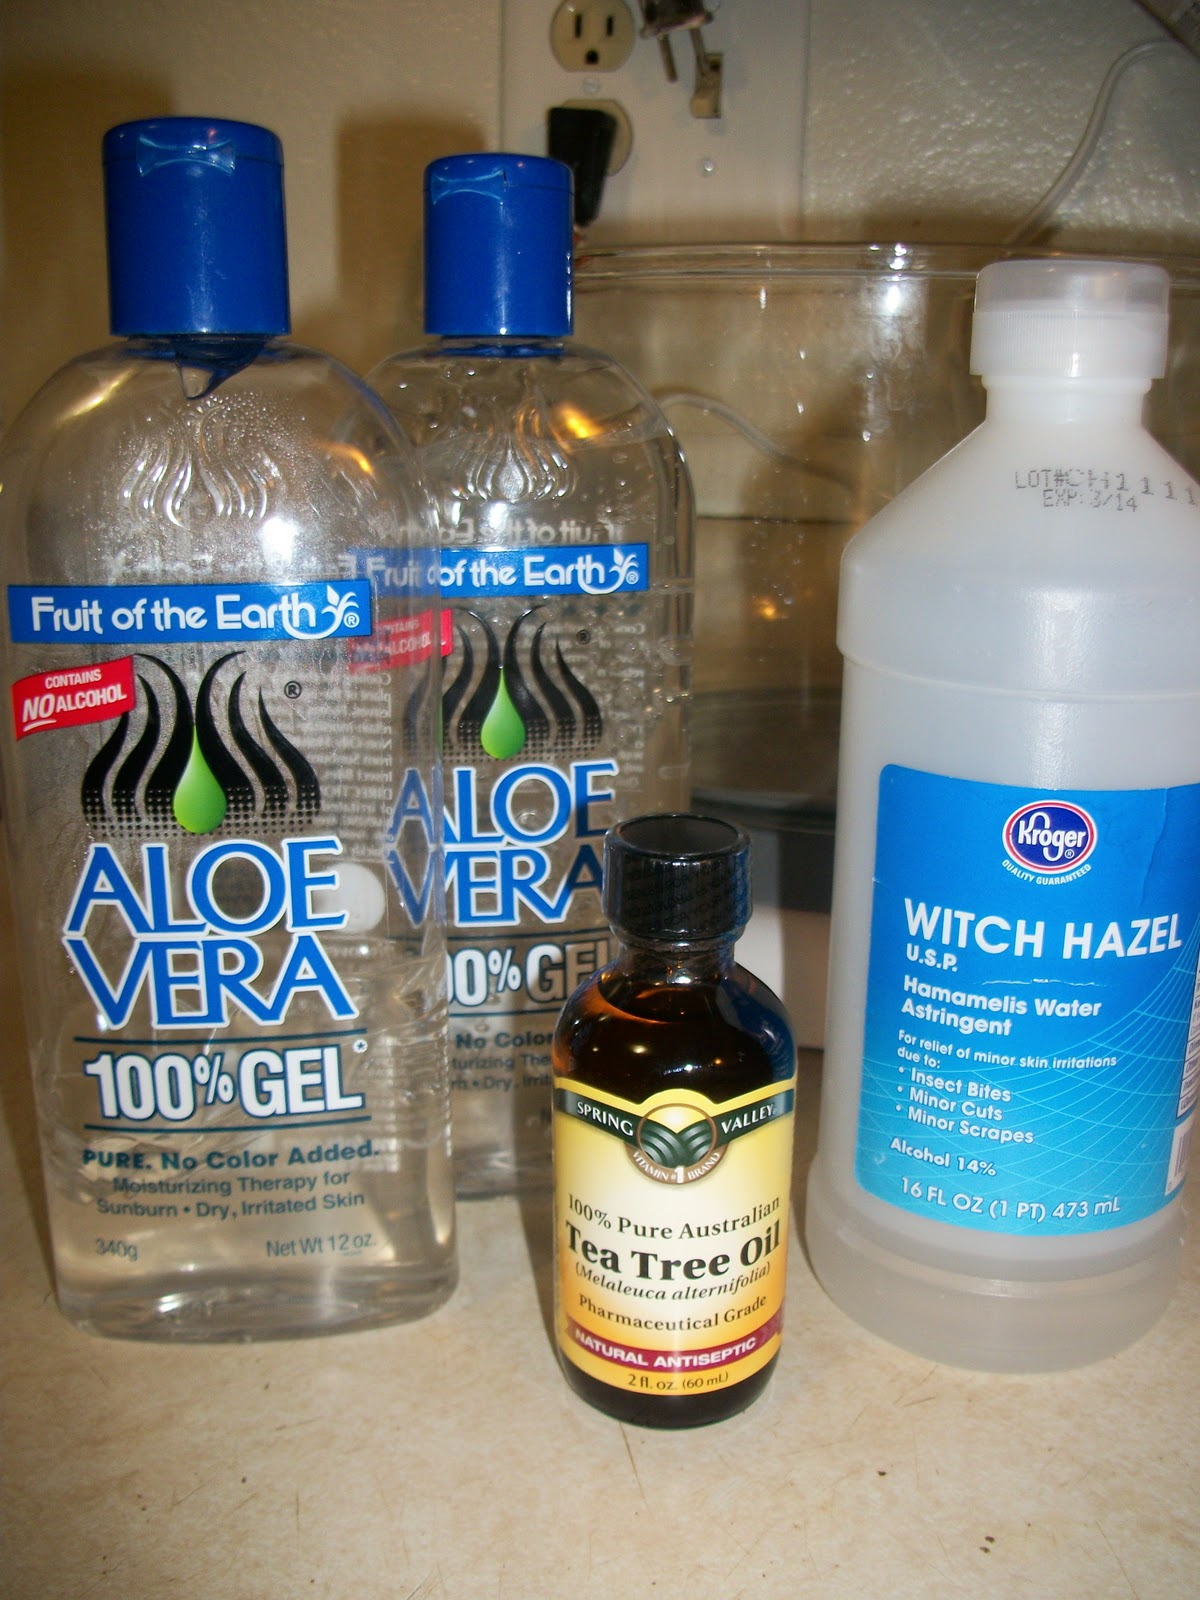 Alcohol free hand gel